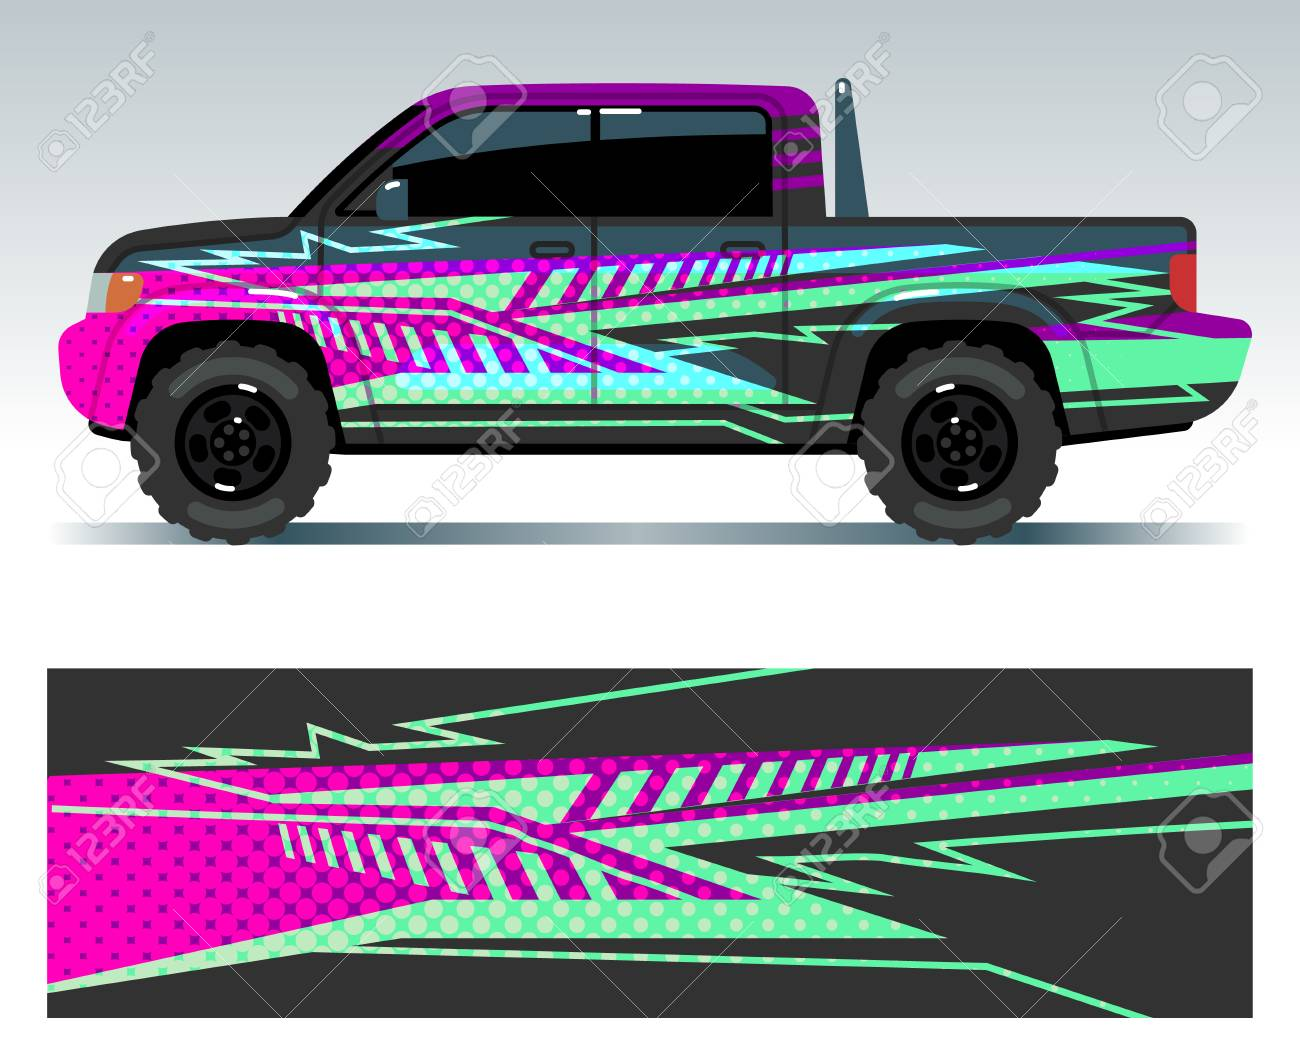 Racing car decals sport vehicle vinyl stickers vector set vinyl decal sticker for car